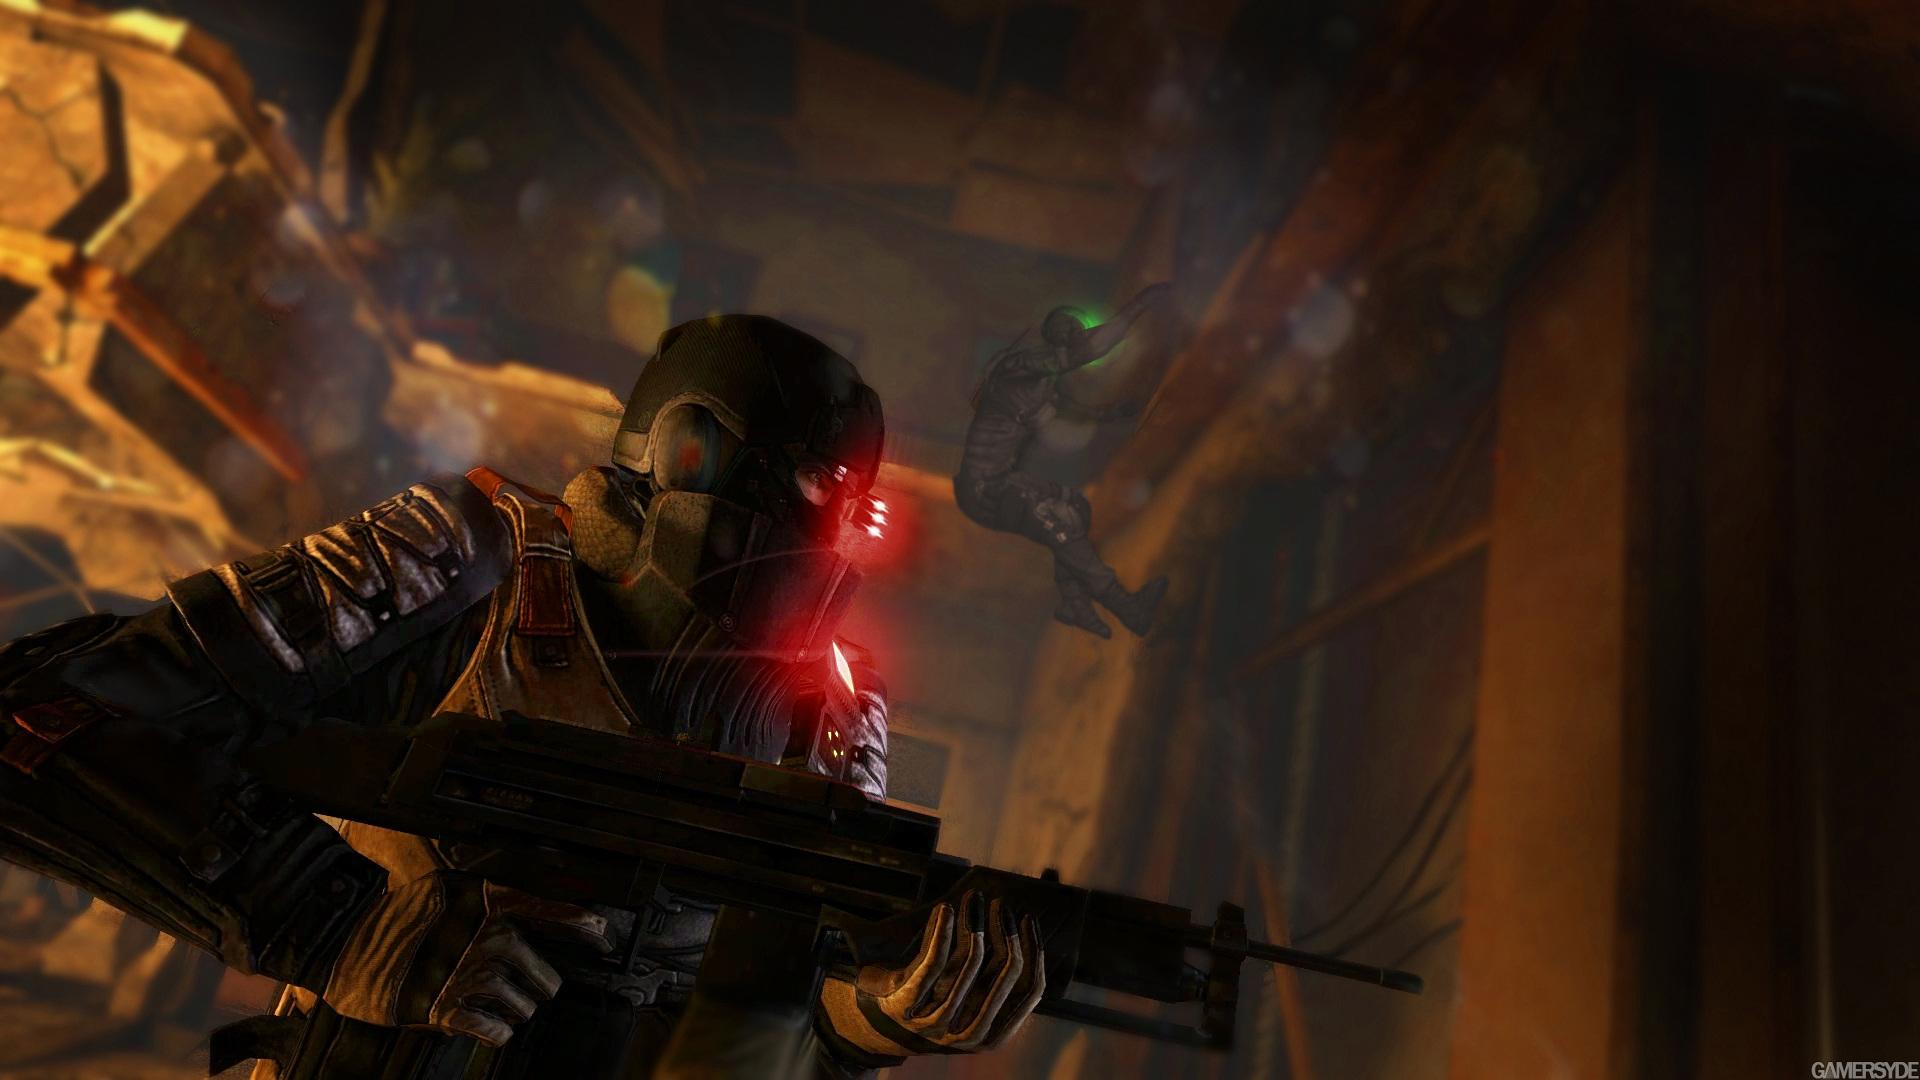 image tom clancy s splinter cell blacklist 22412 2521 0001 با تصاویر جدید Splinter Cell: Blacklist همراه باشید